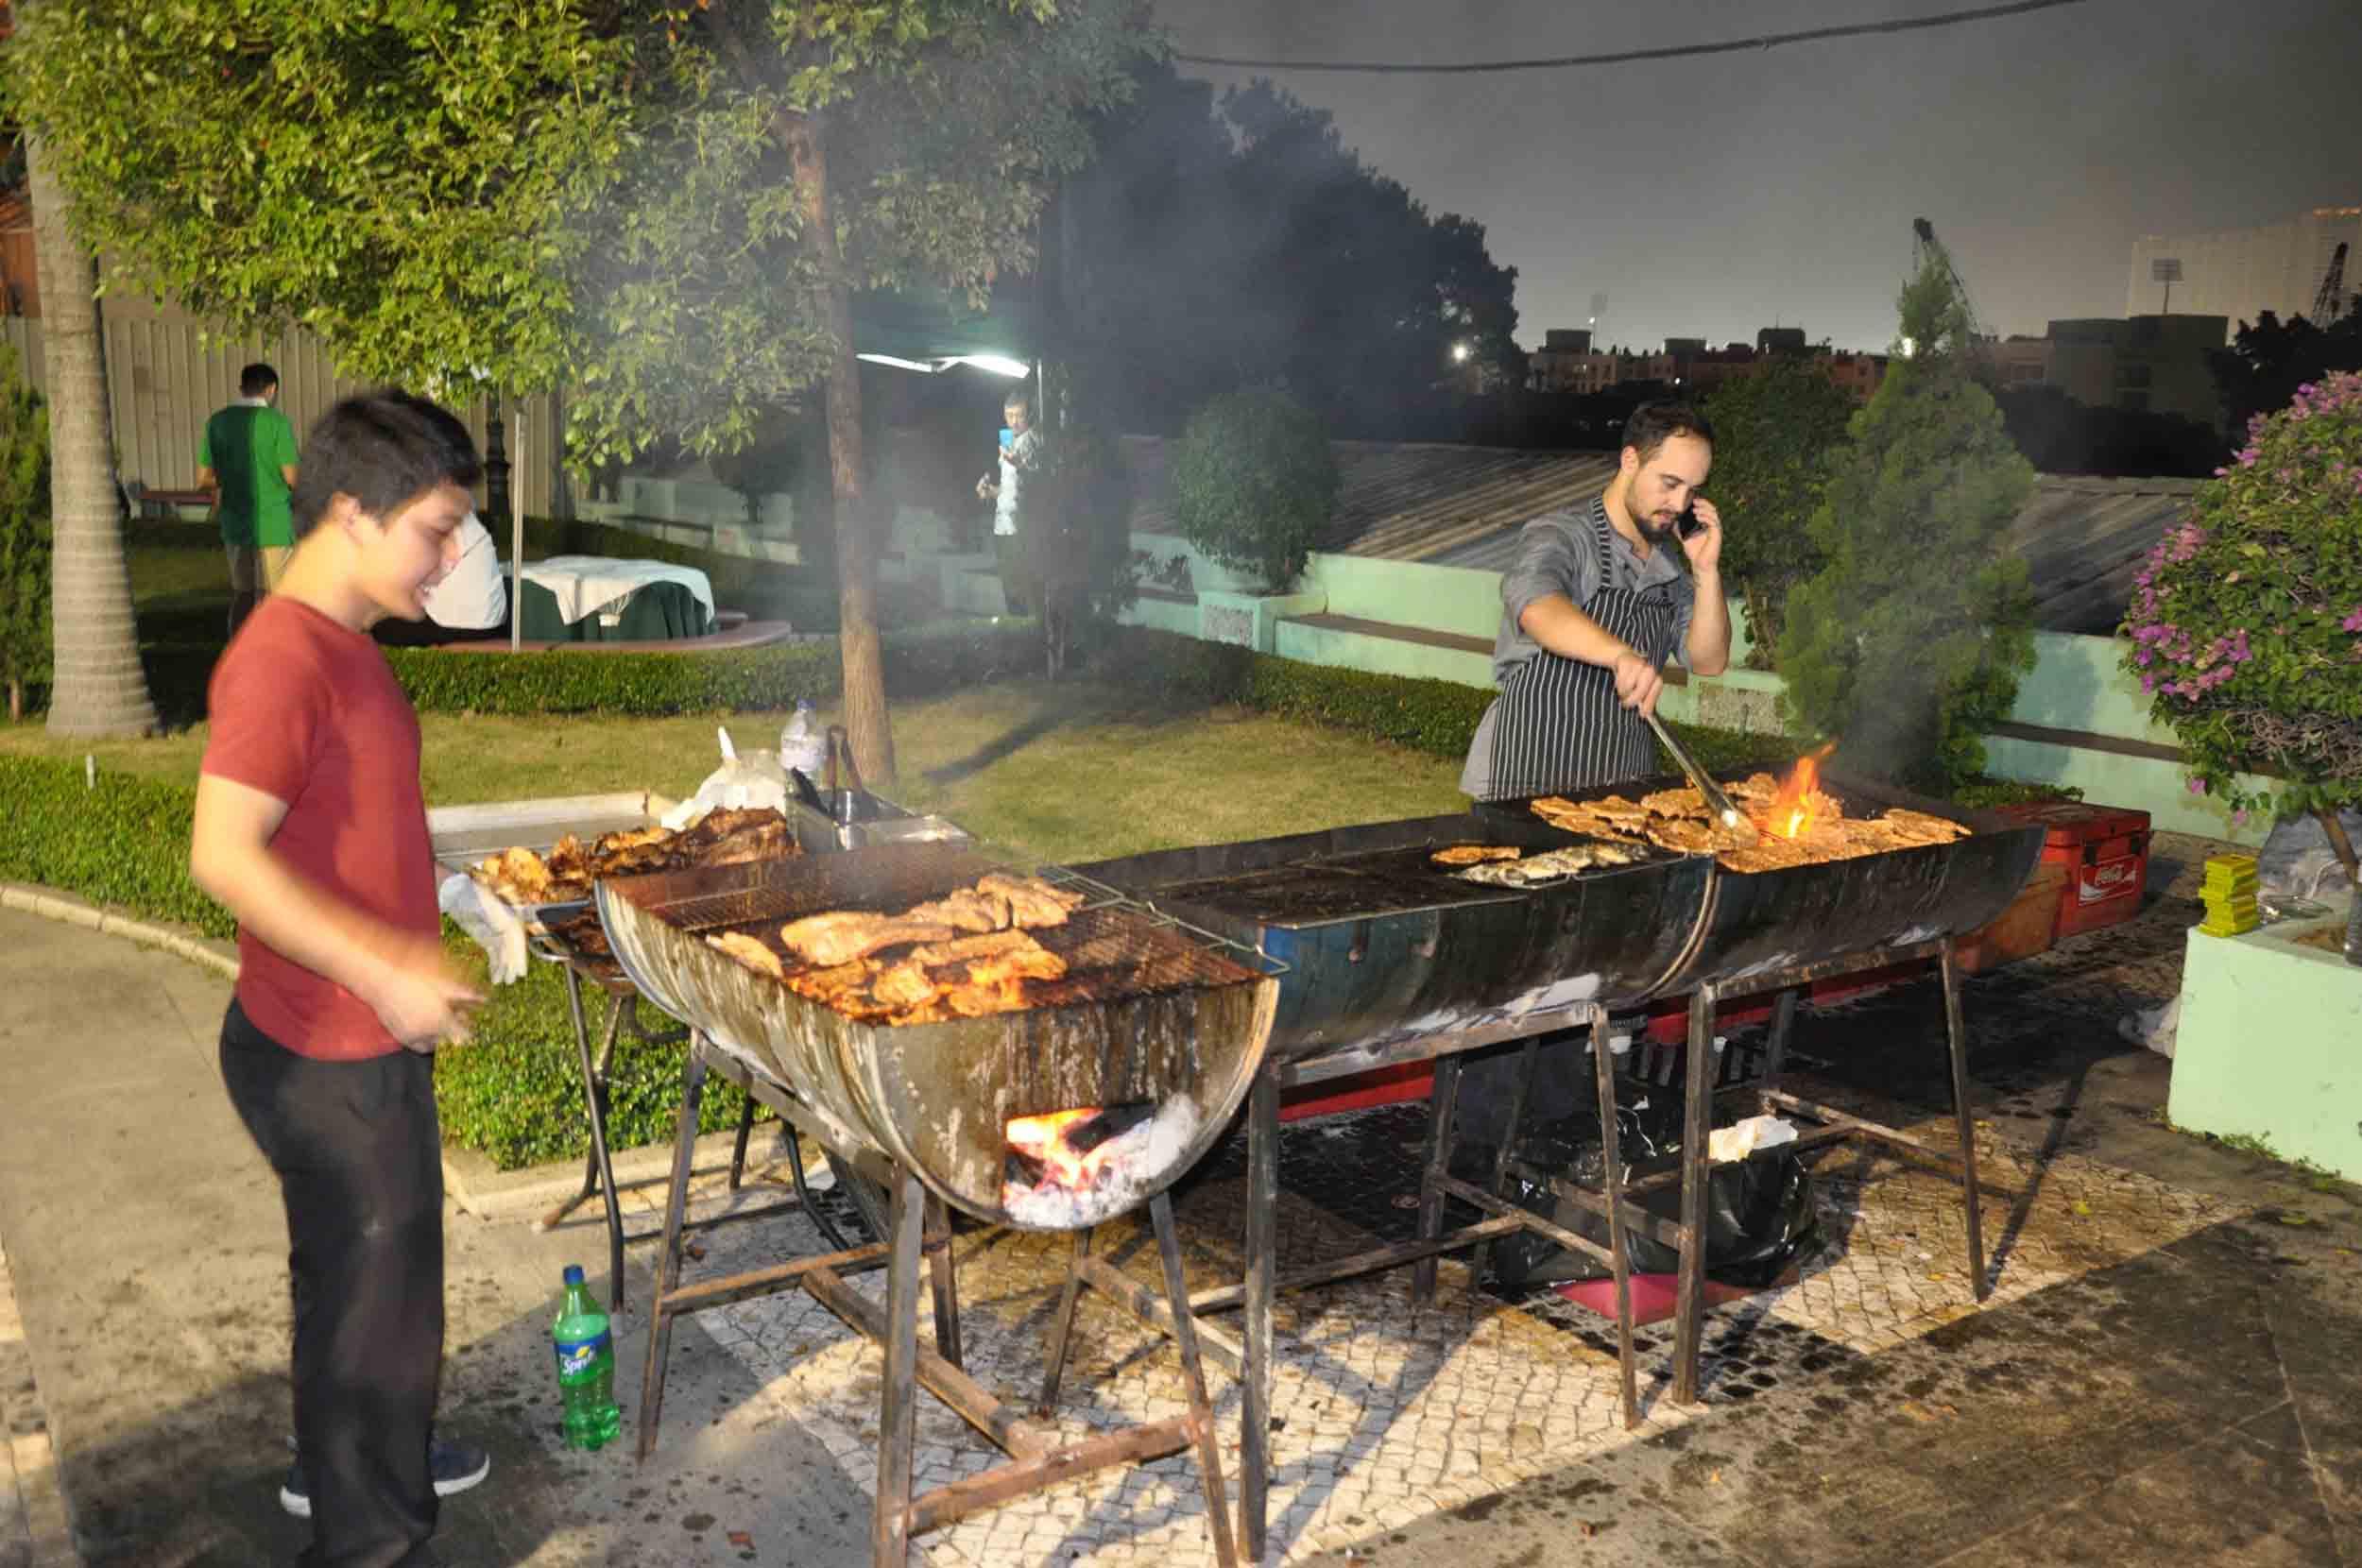 Lusofonia Festival Barbecue area